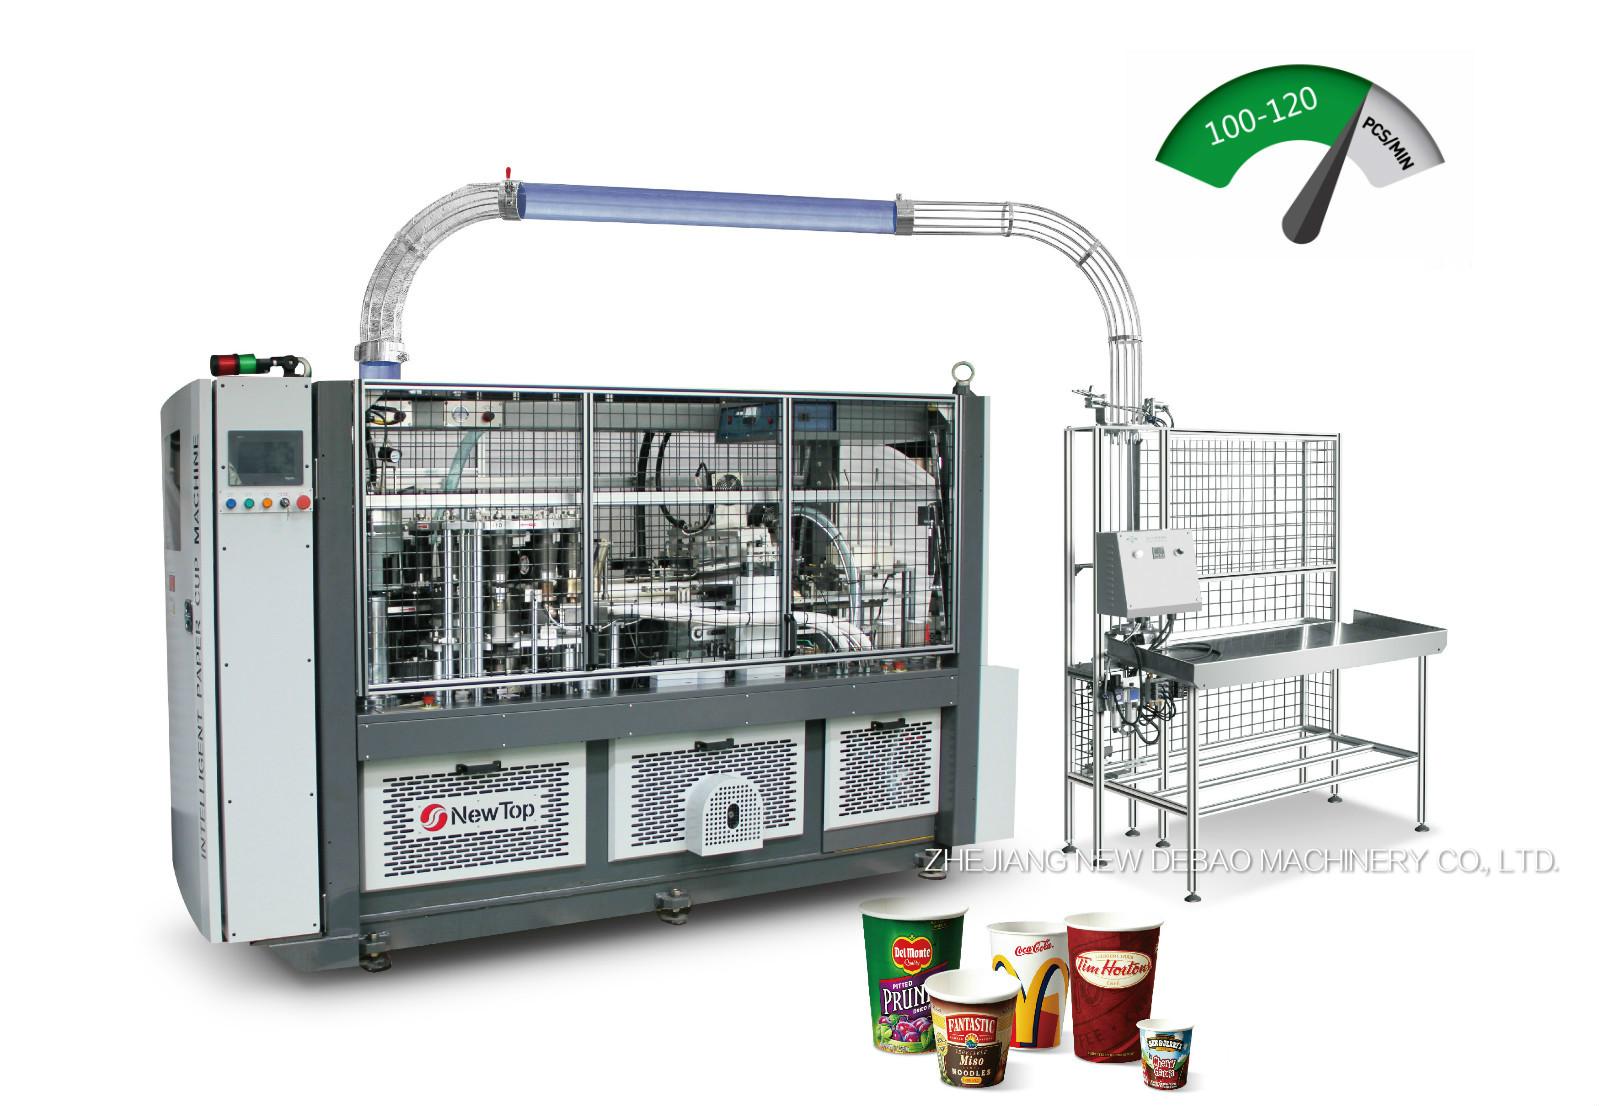 New Debao Machinery Array image96